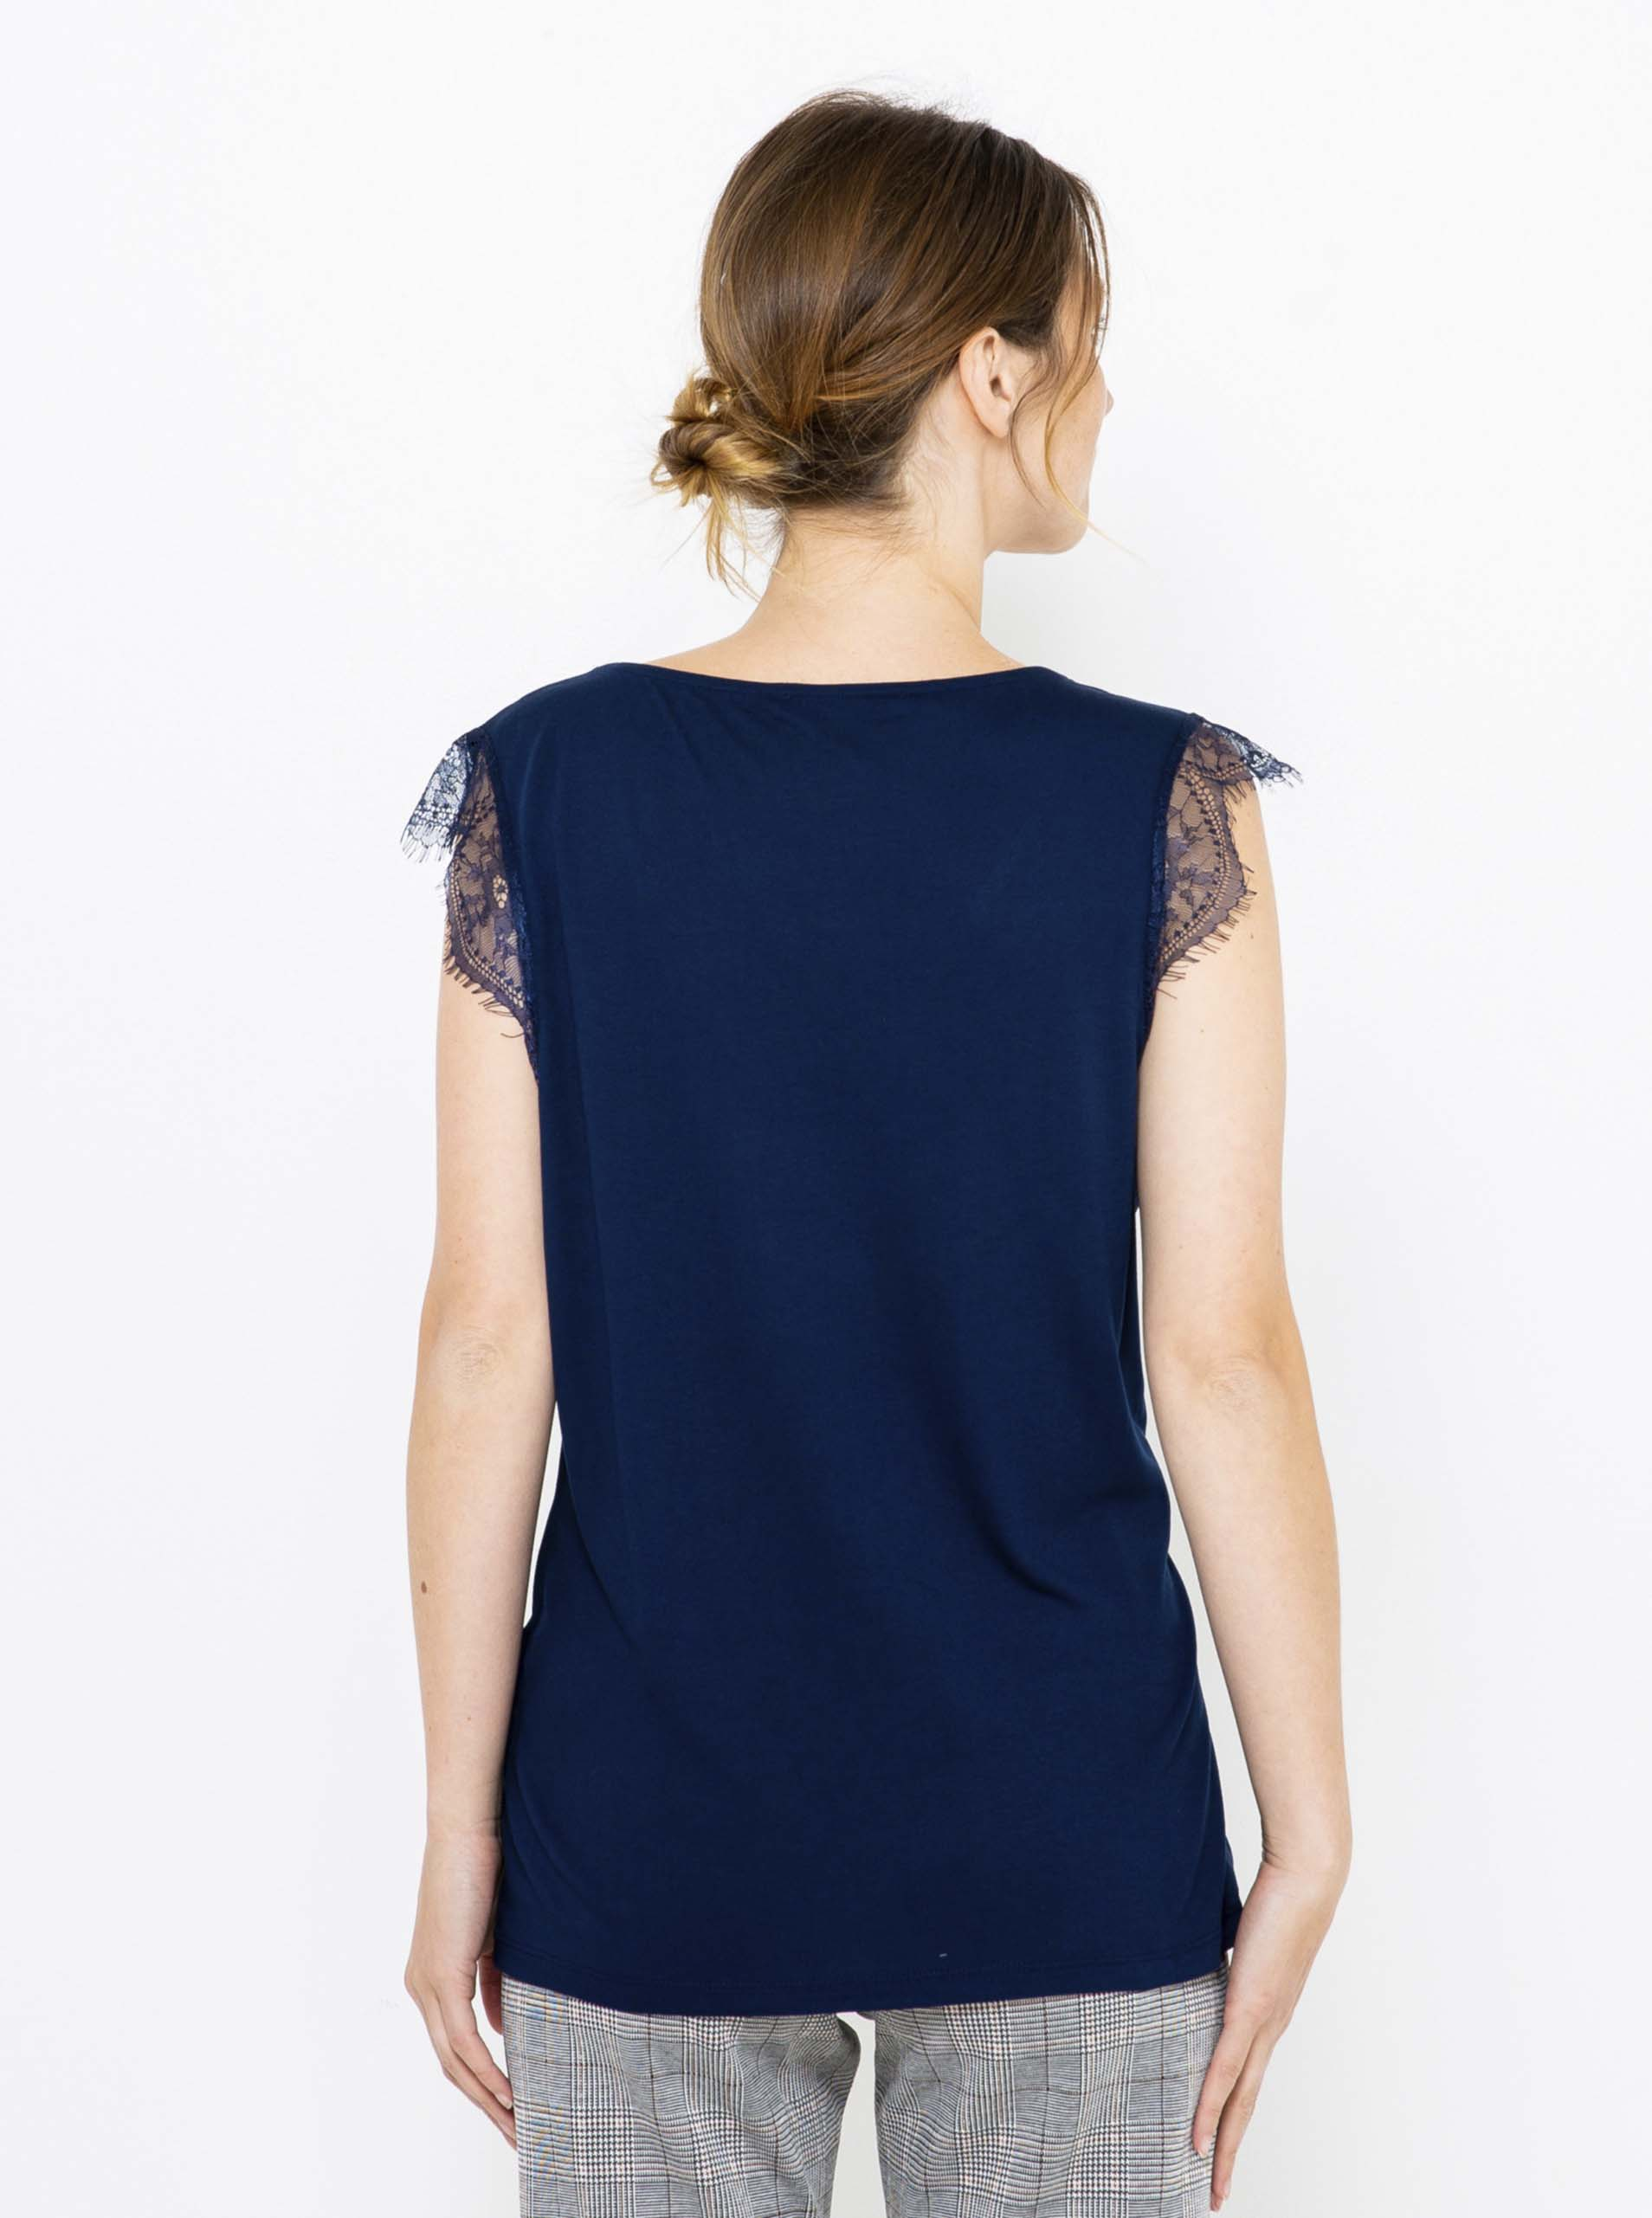 CAMAIEU Women's blouse petrol blue